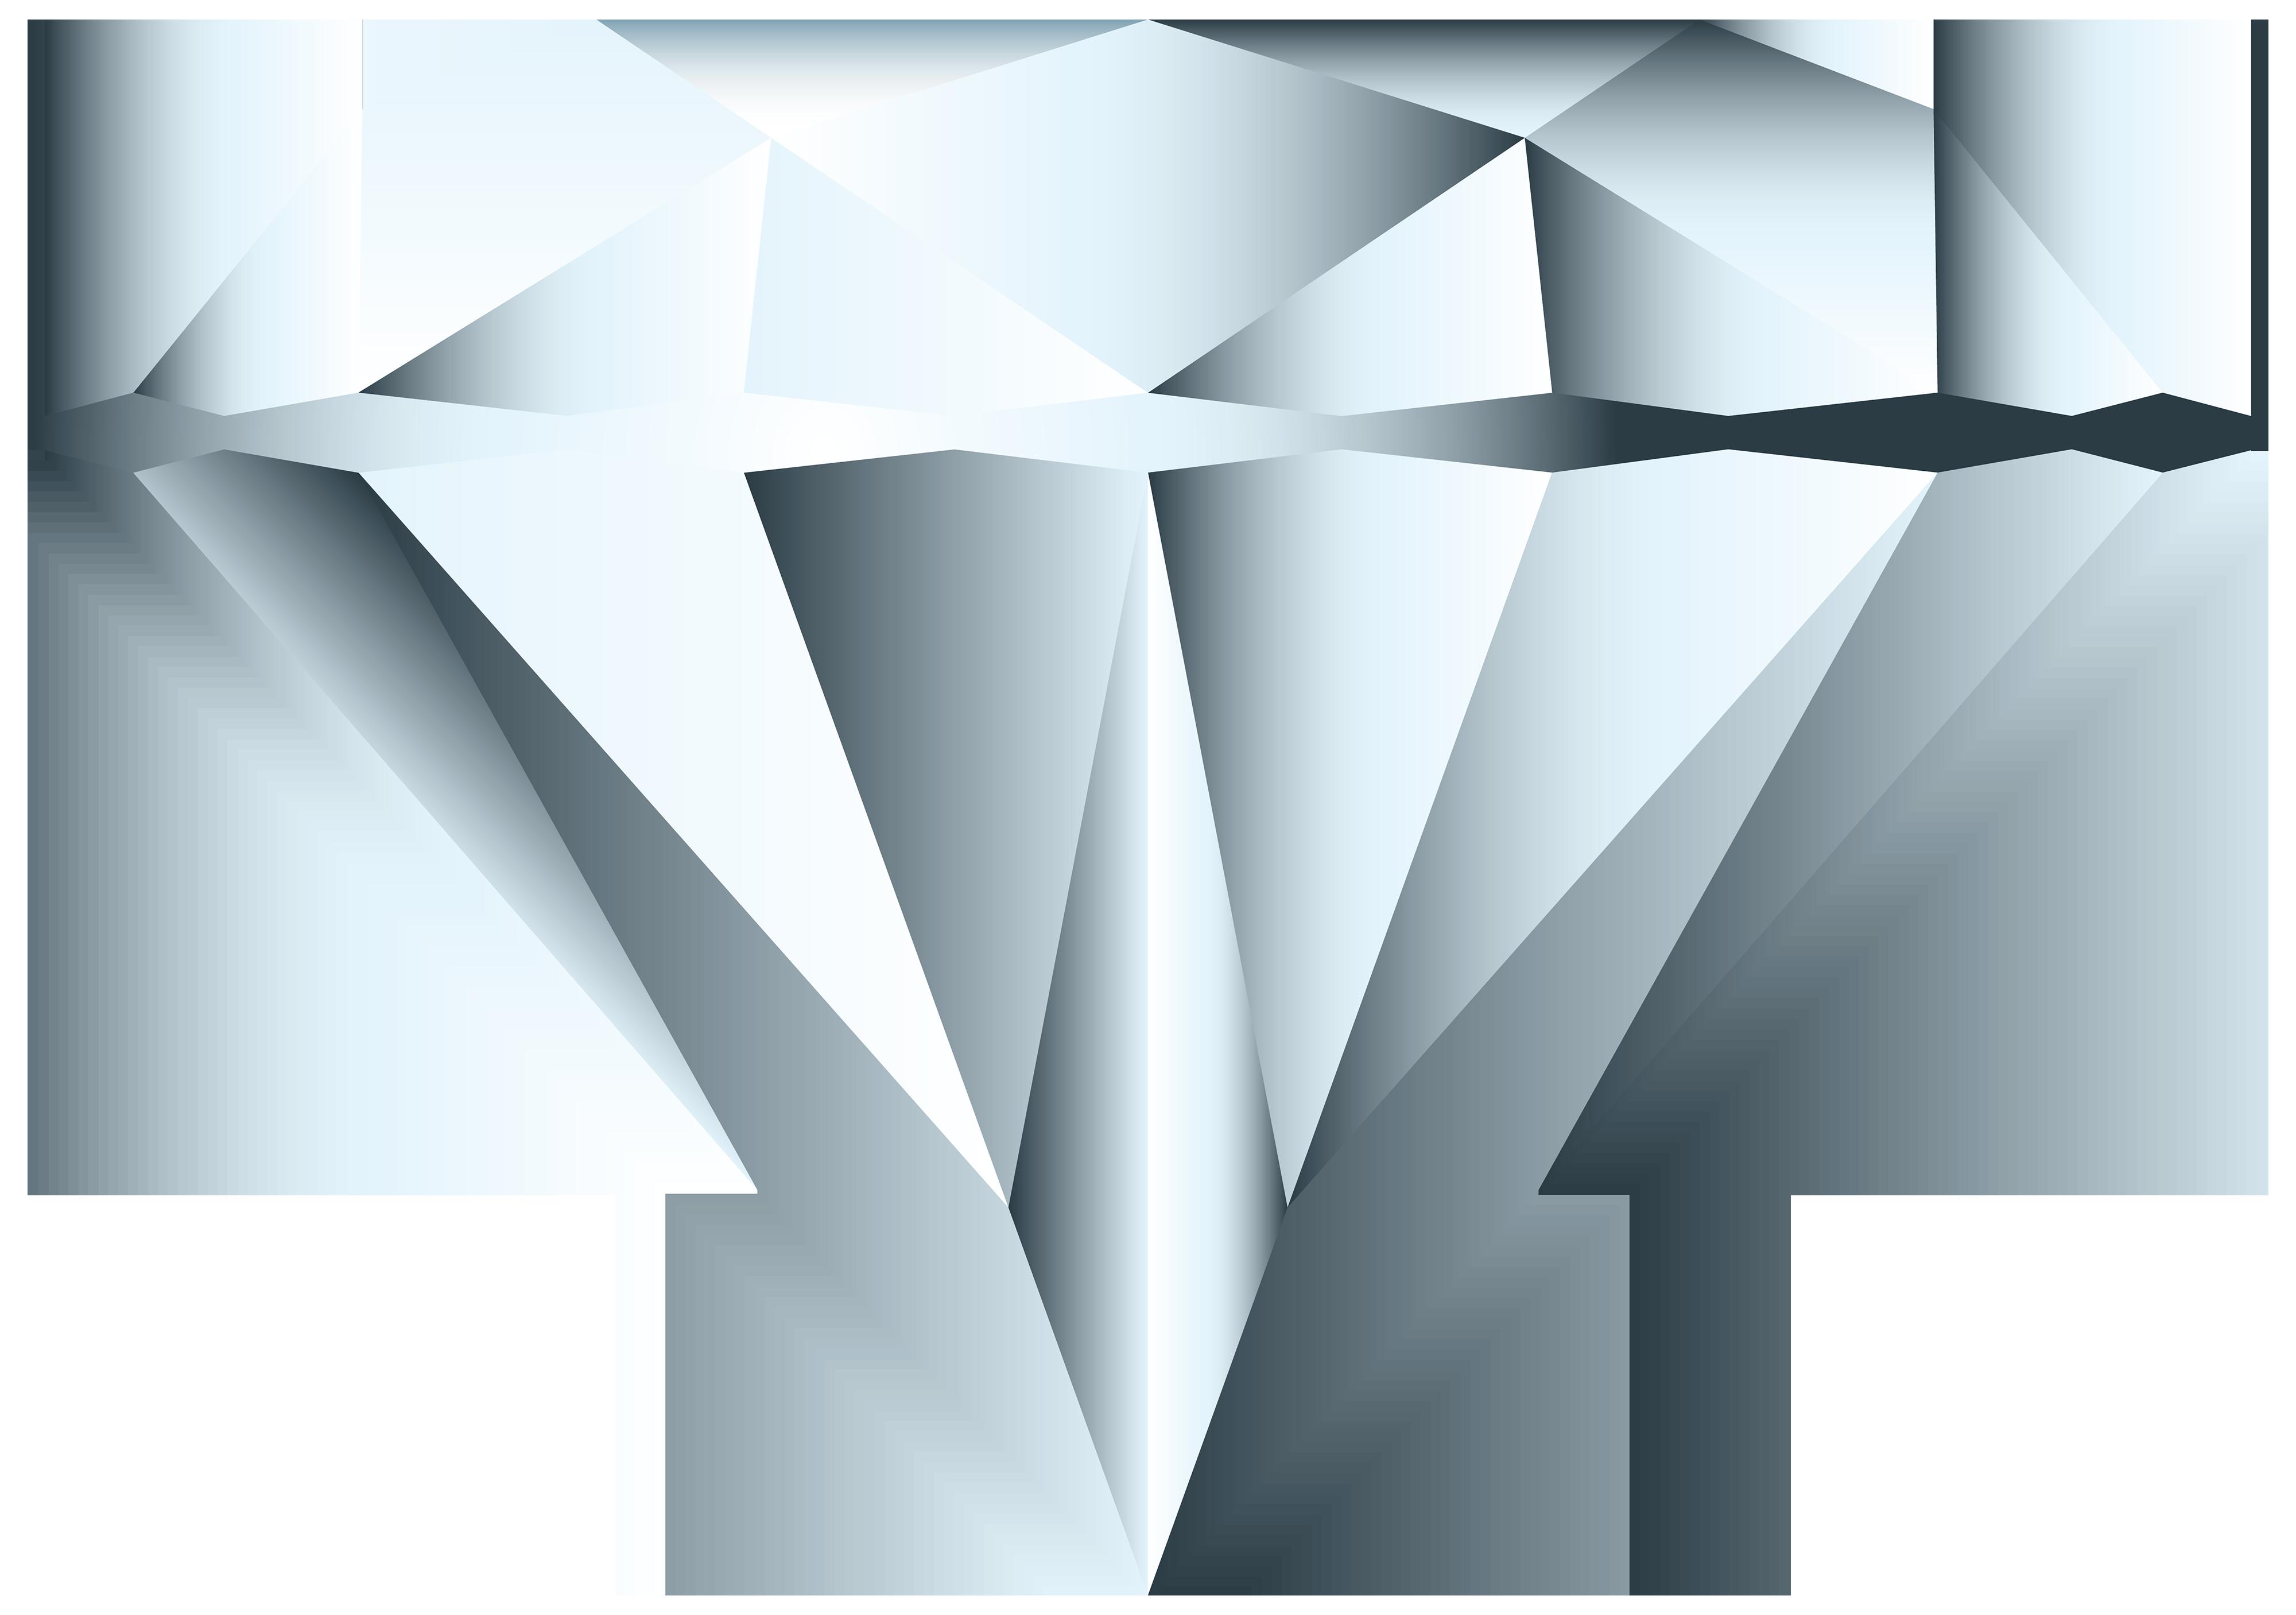 Diamond clipart #13